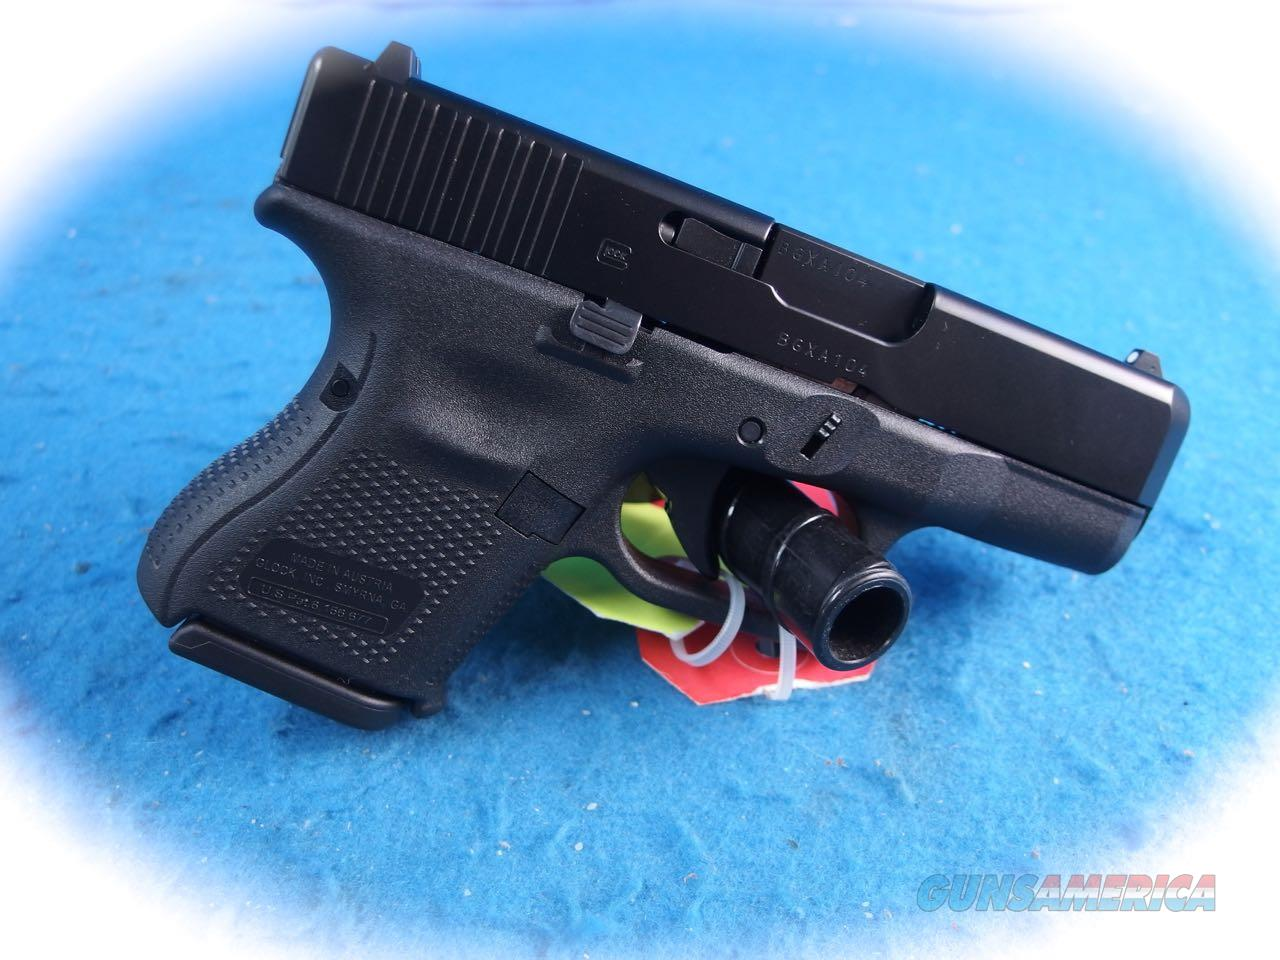 Glock Model 26 Gen 5 9mm Sub-Compact Pistol **New**  Guns > Pistols > Glock Pistols > 26/27